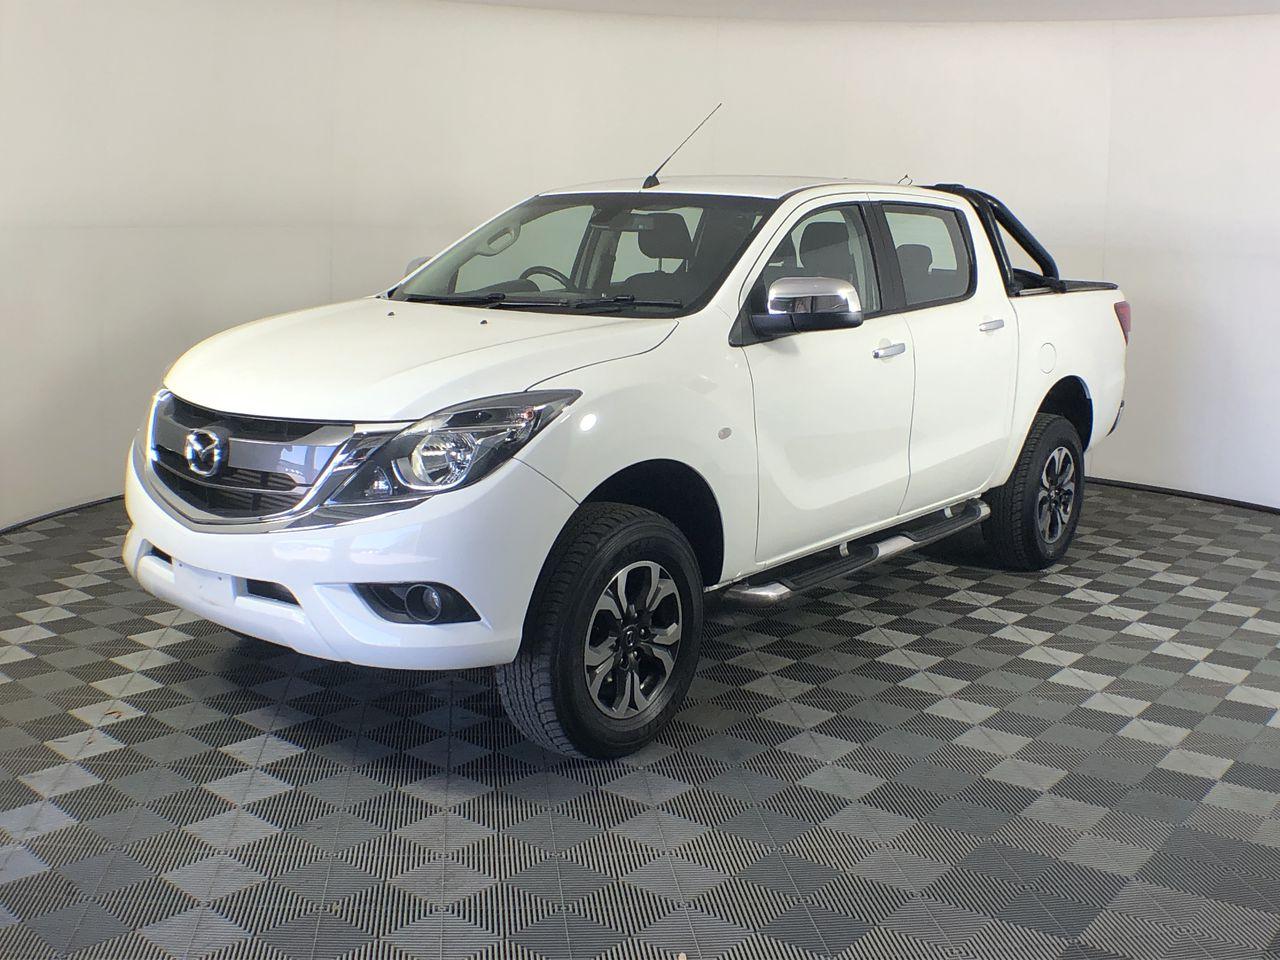 2018 Mazda BT-50 4X2 XTR Turbo Diesel Automatic Dual Cab 43,480 kms